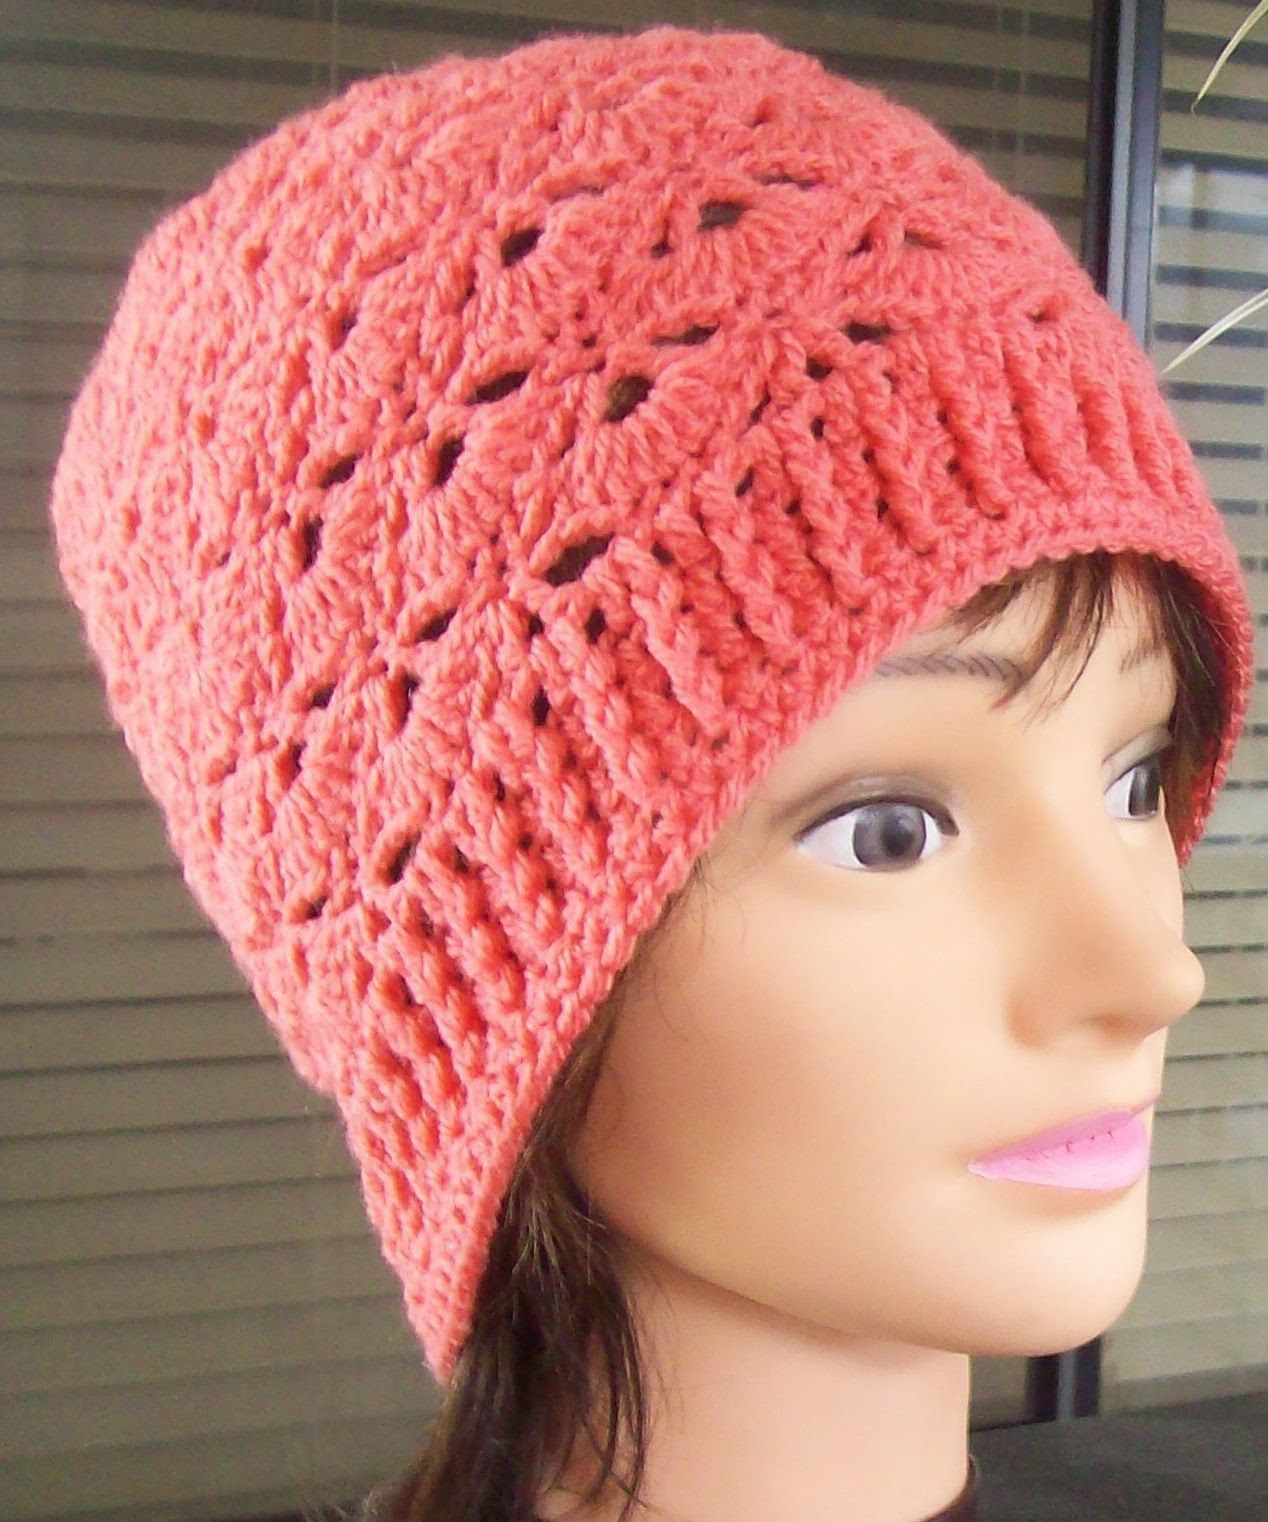 Crochet Patterns Hats For Adults : Free Crochet Patterns By Cats-Rockin-Crochet